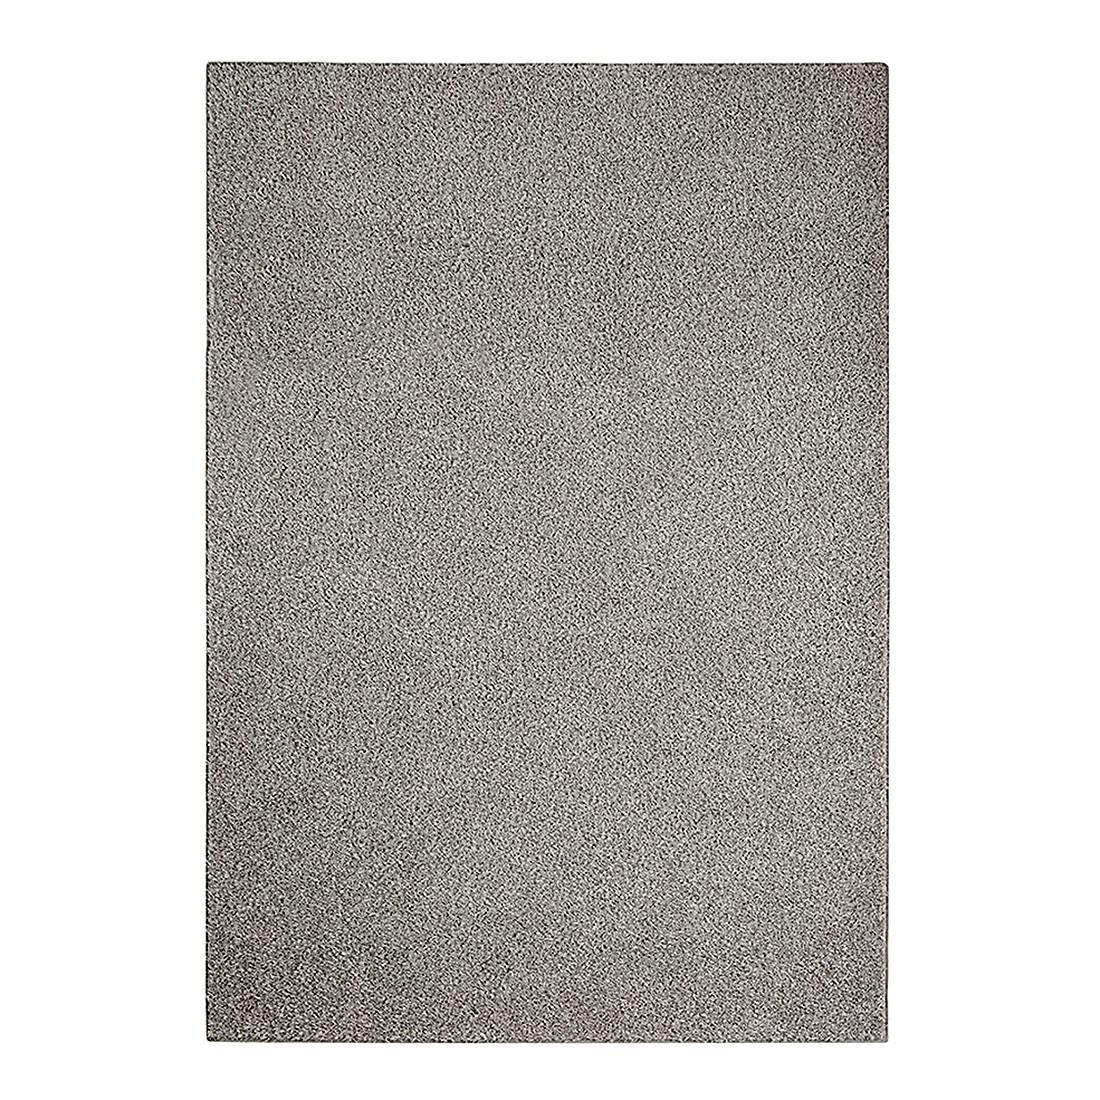 Outdoortapijt b.b Miami Style - grijs - 67x130cm, barbara becker home passion